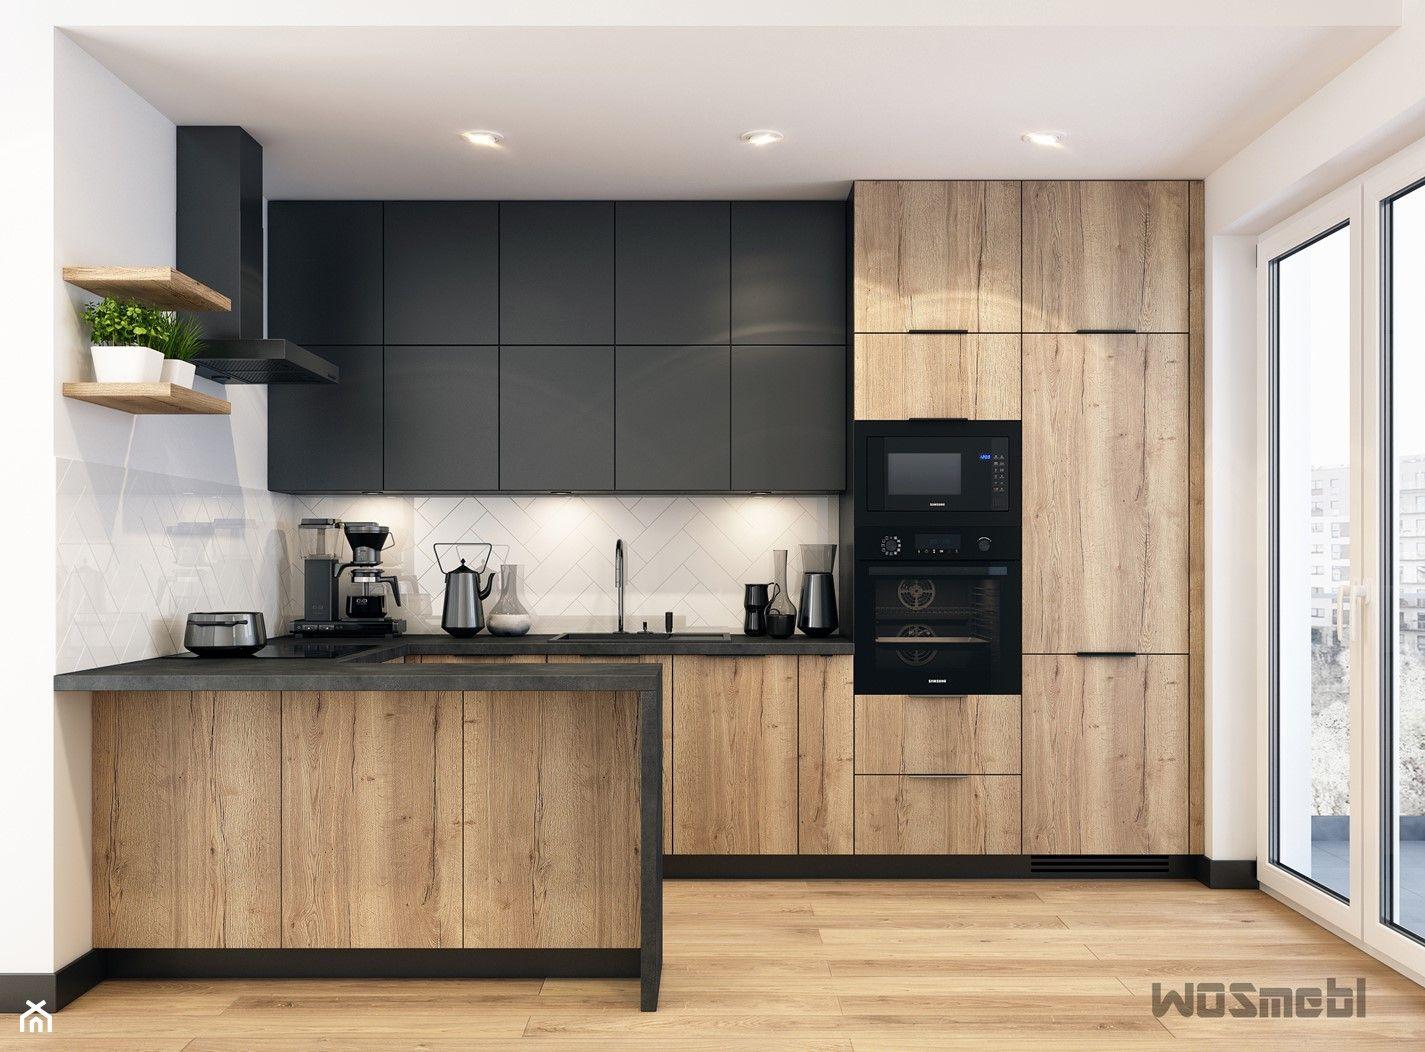 Kuchnia Styl Industrialny Modern Kitchen Cabinets Kitchen Renovation Kitchen Interior